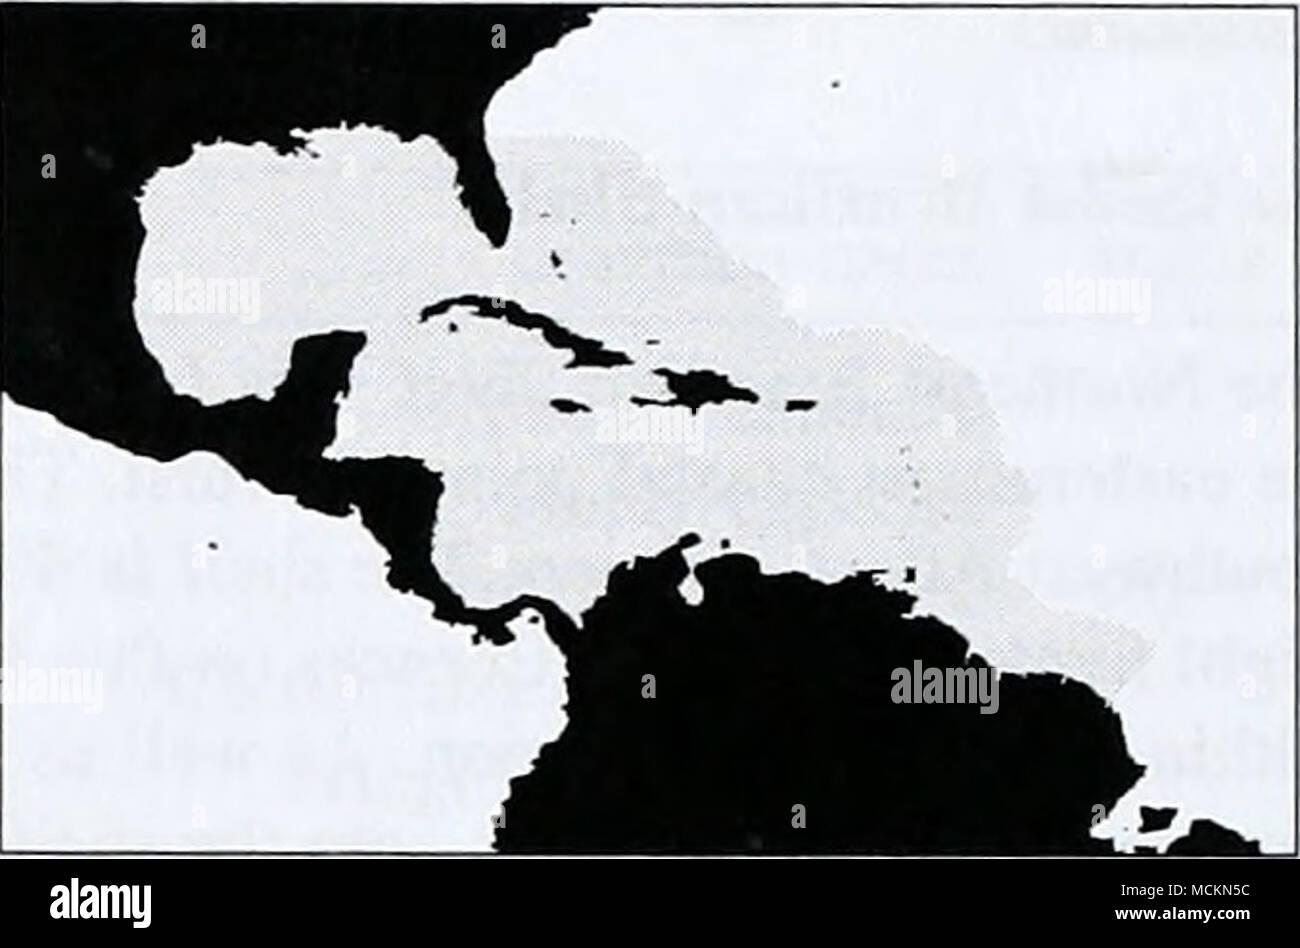 Karibik Anguilla (UK) Antigua und Barbuda, Aruba (Niederlande ...